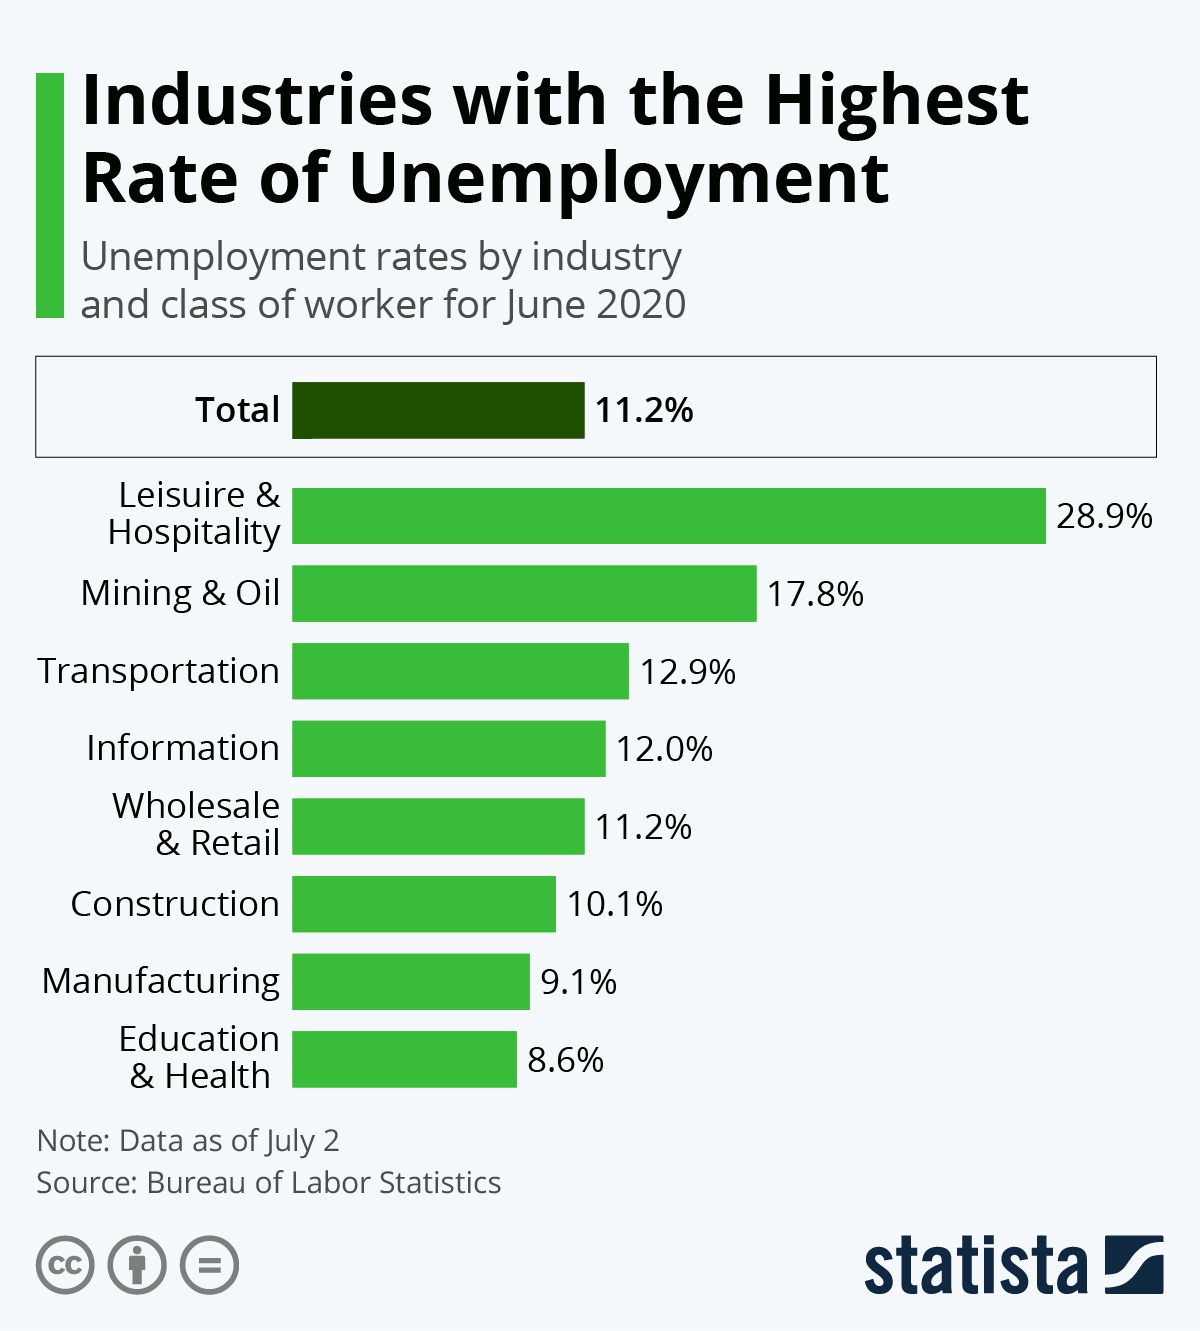 statista图表显示,休闲酒店业、采矿石油业与运输业为美国失业率最高的...